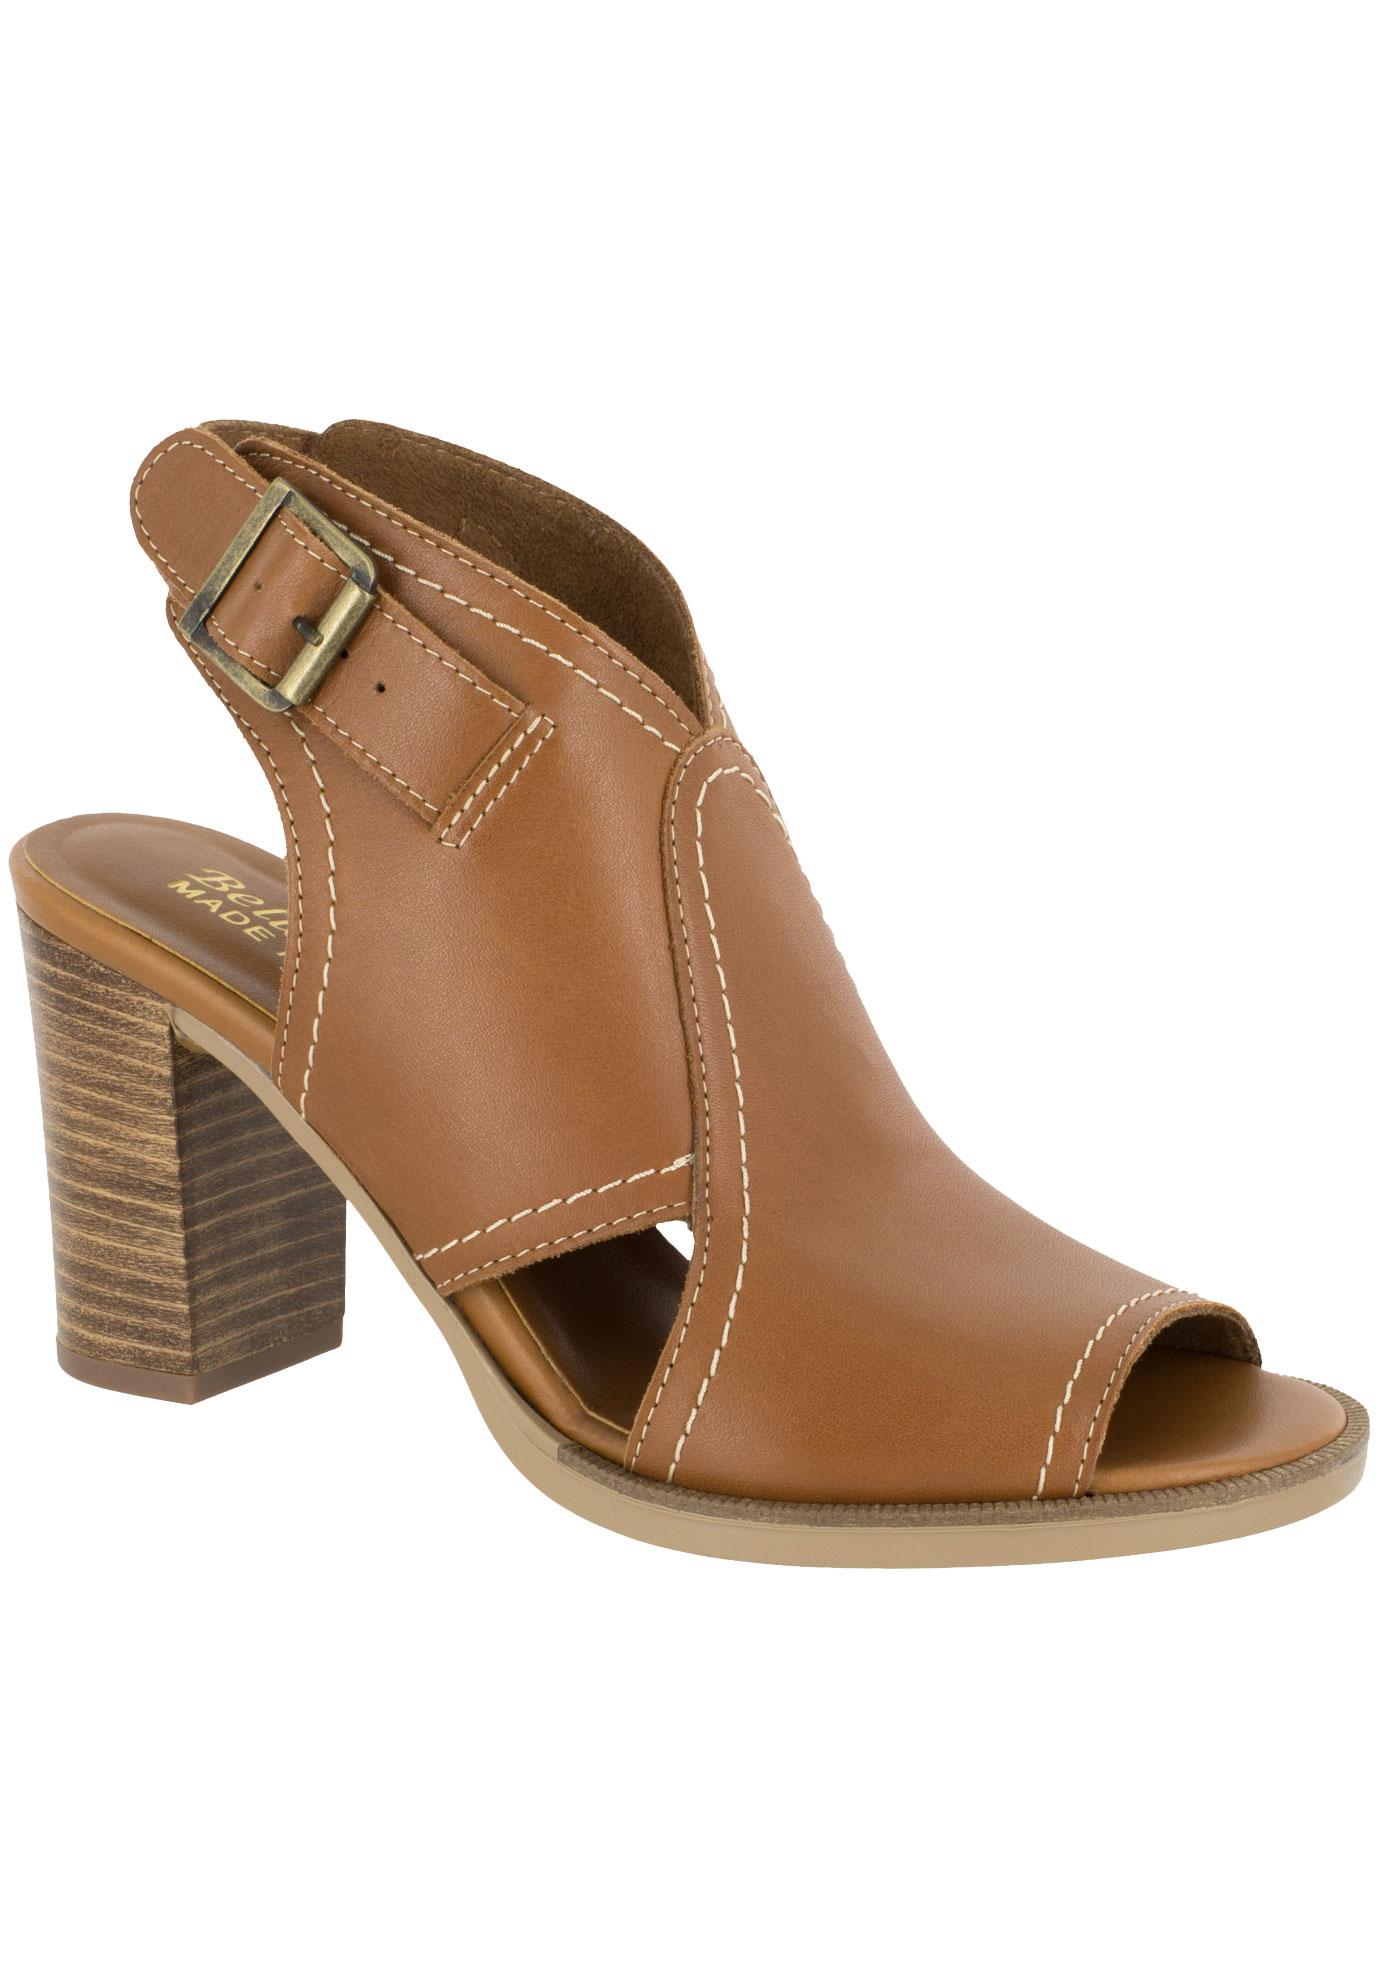 Bella-Vita Viv-Italy Sandal